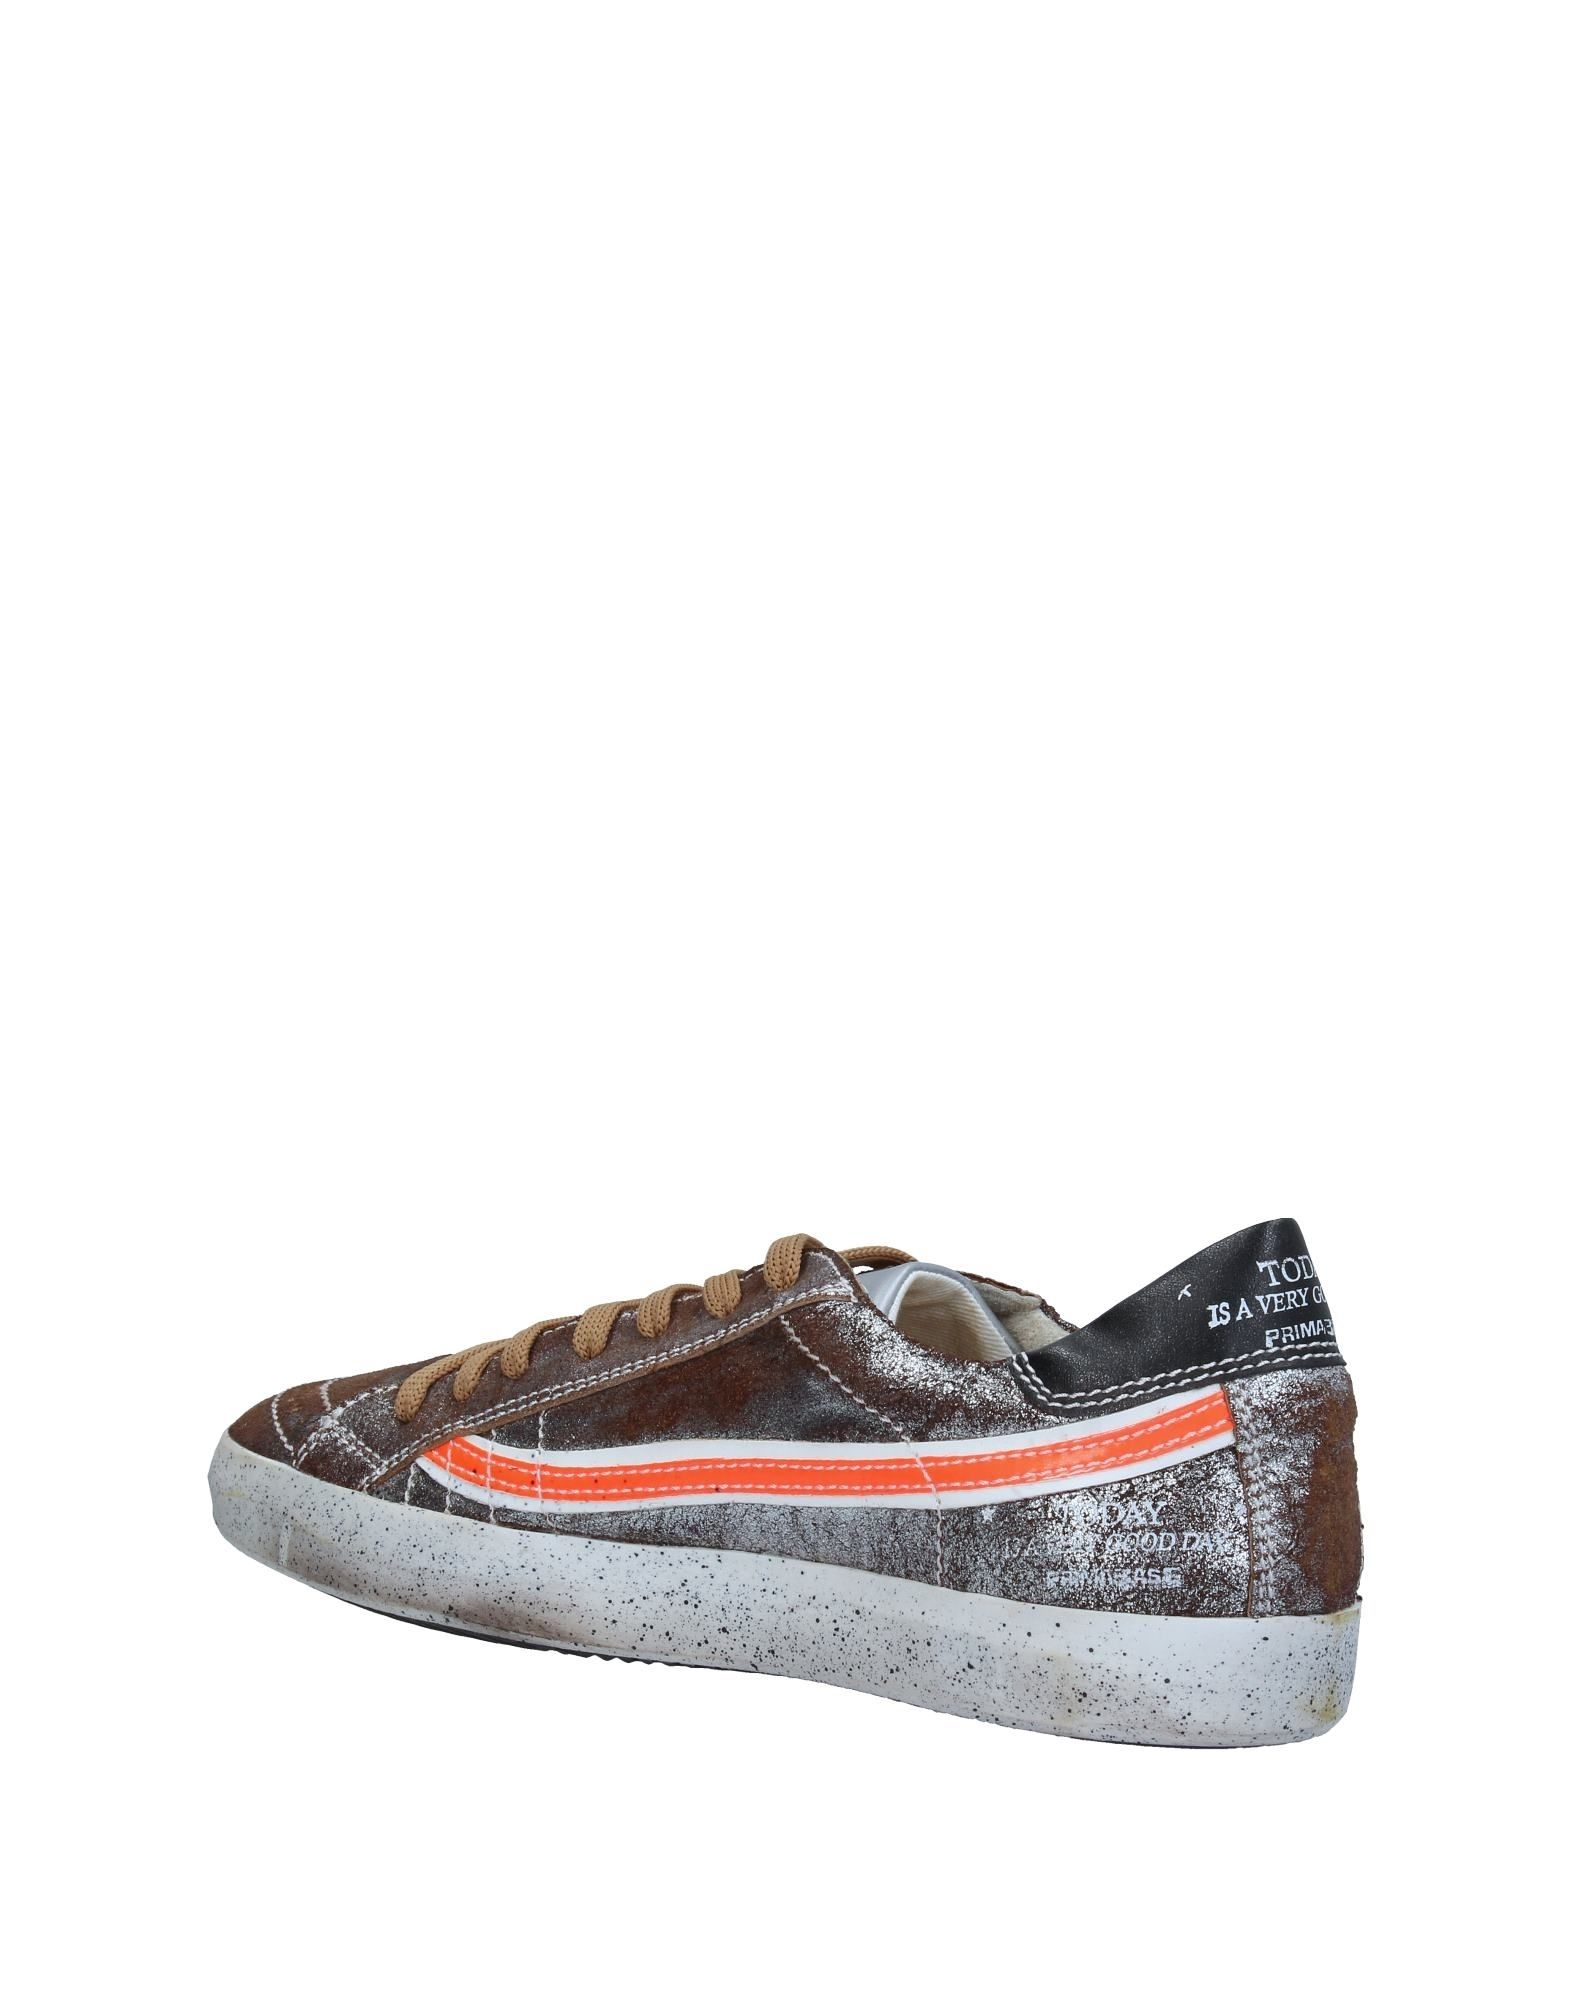 Moda Sneakers Primabase Primabase Primabase Uomo - 11363776JT fab2c6